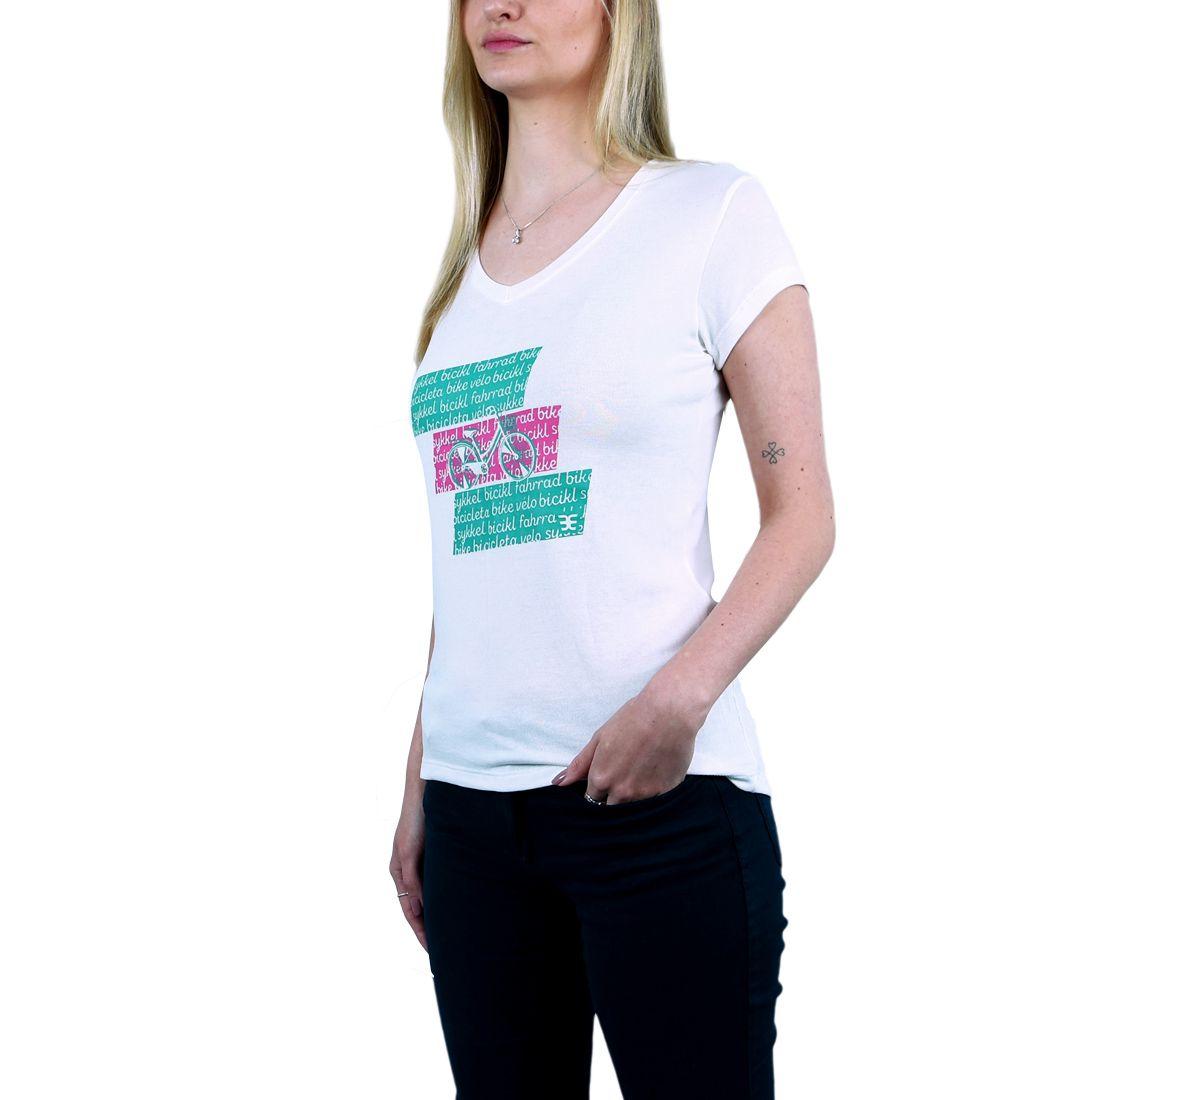 Camiseta Bici Mundi Fem - Off White - Woom 247